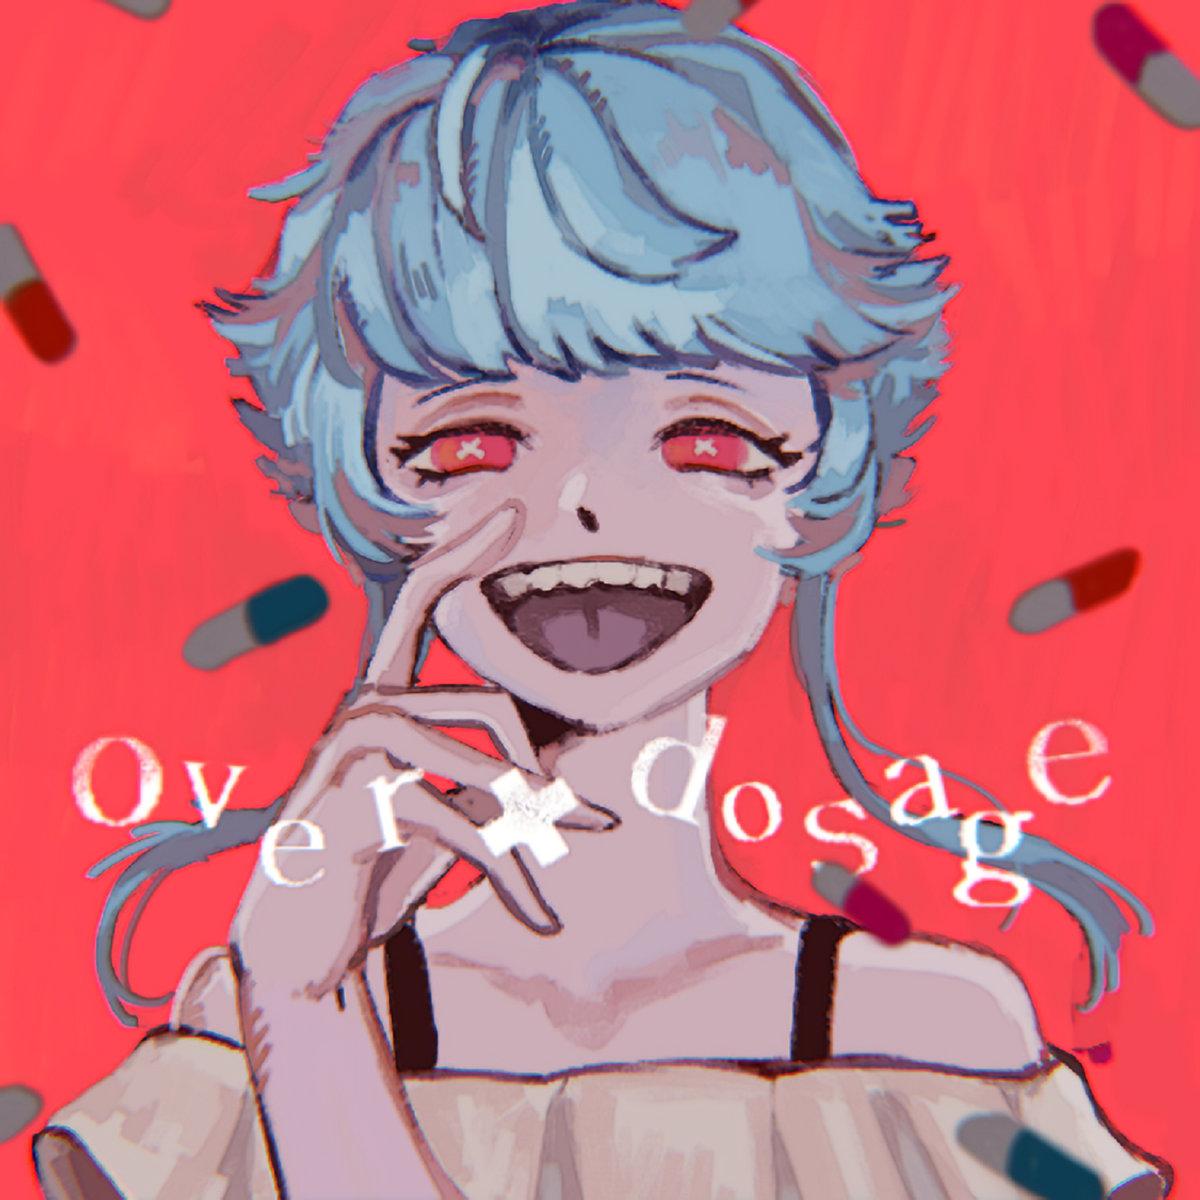 Over ✖ dosage (single)